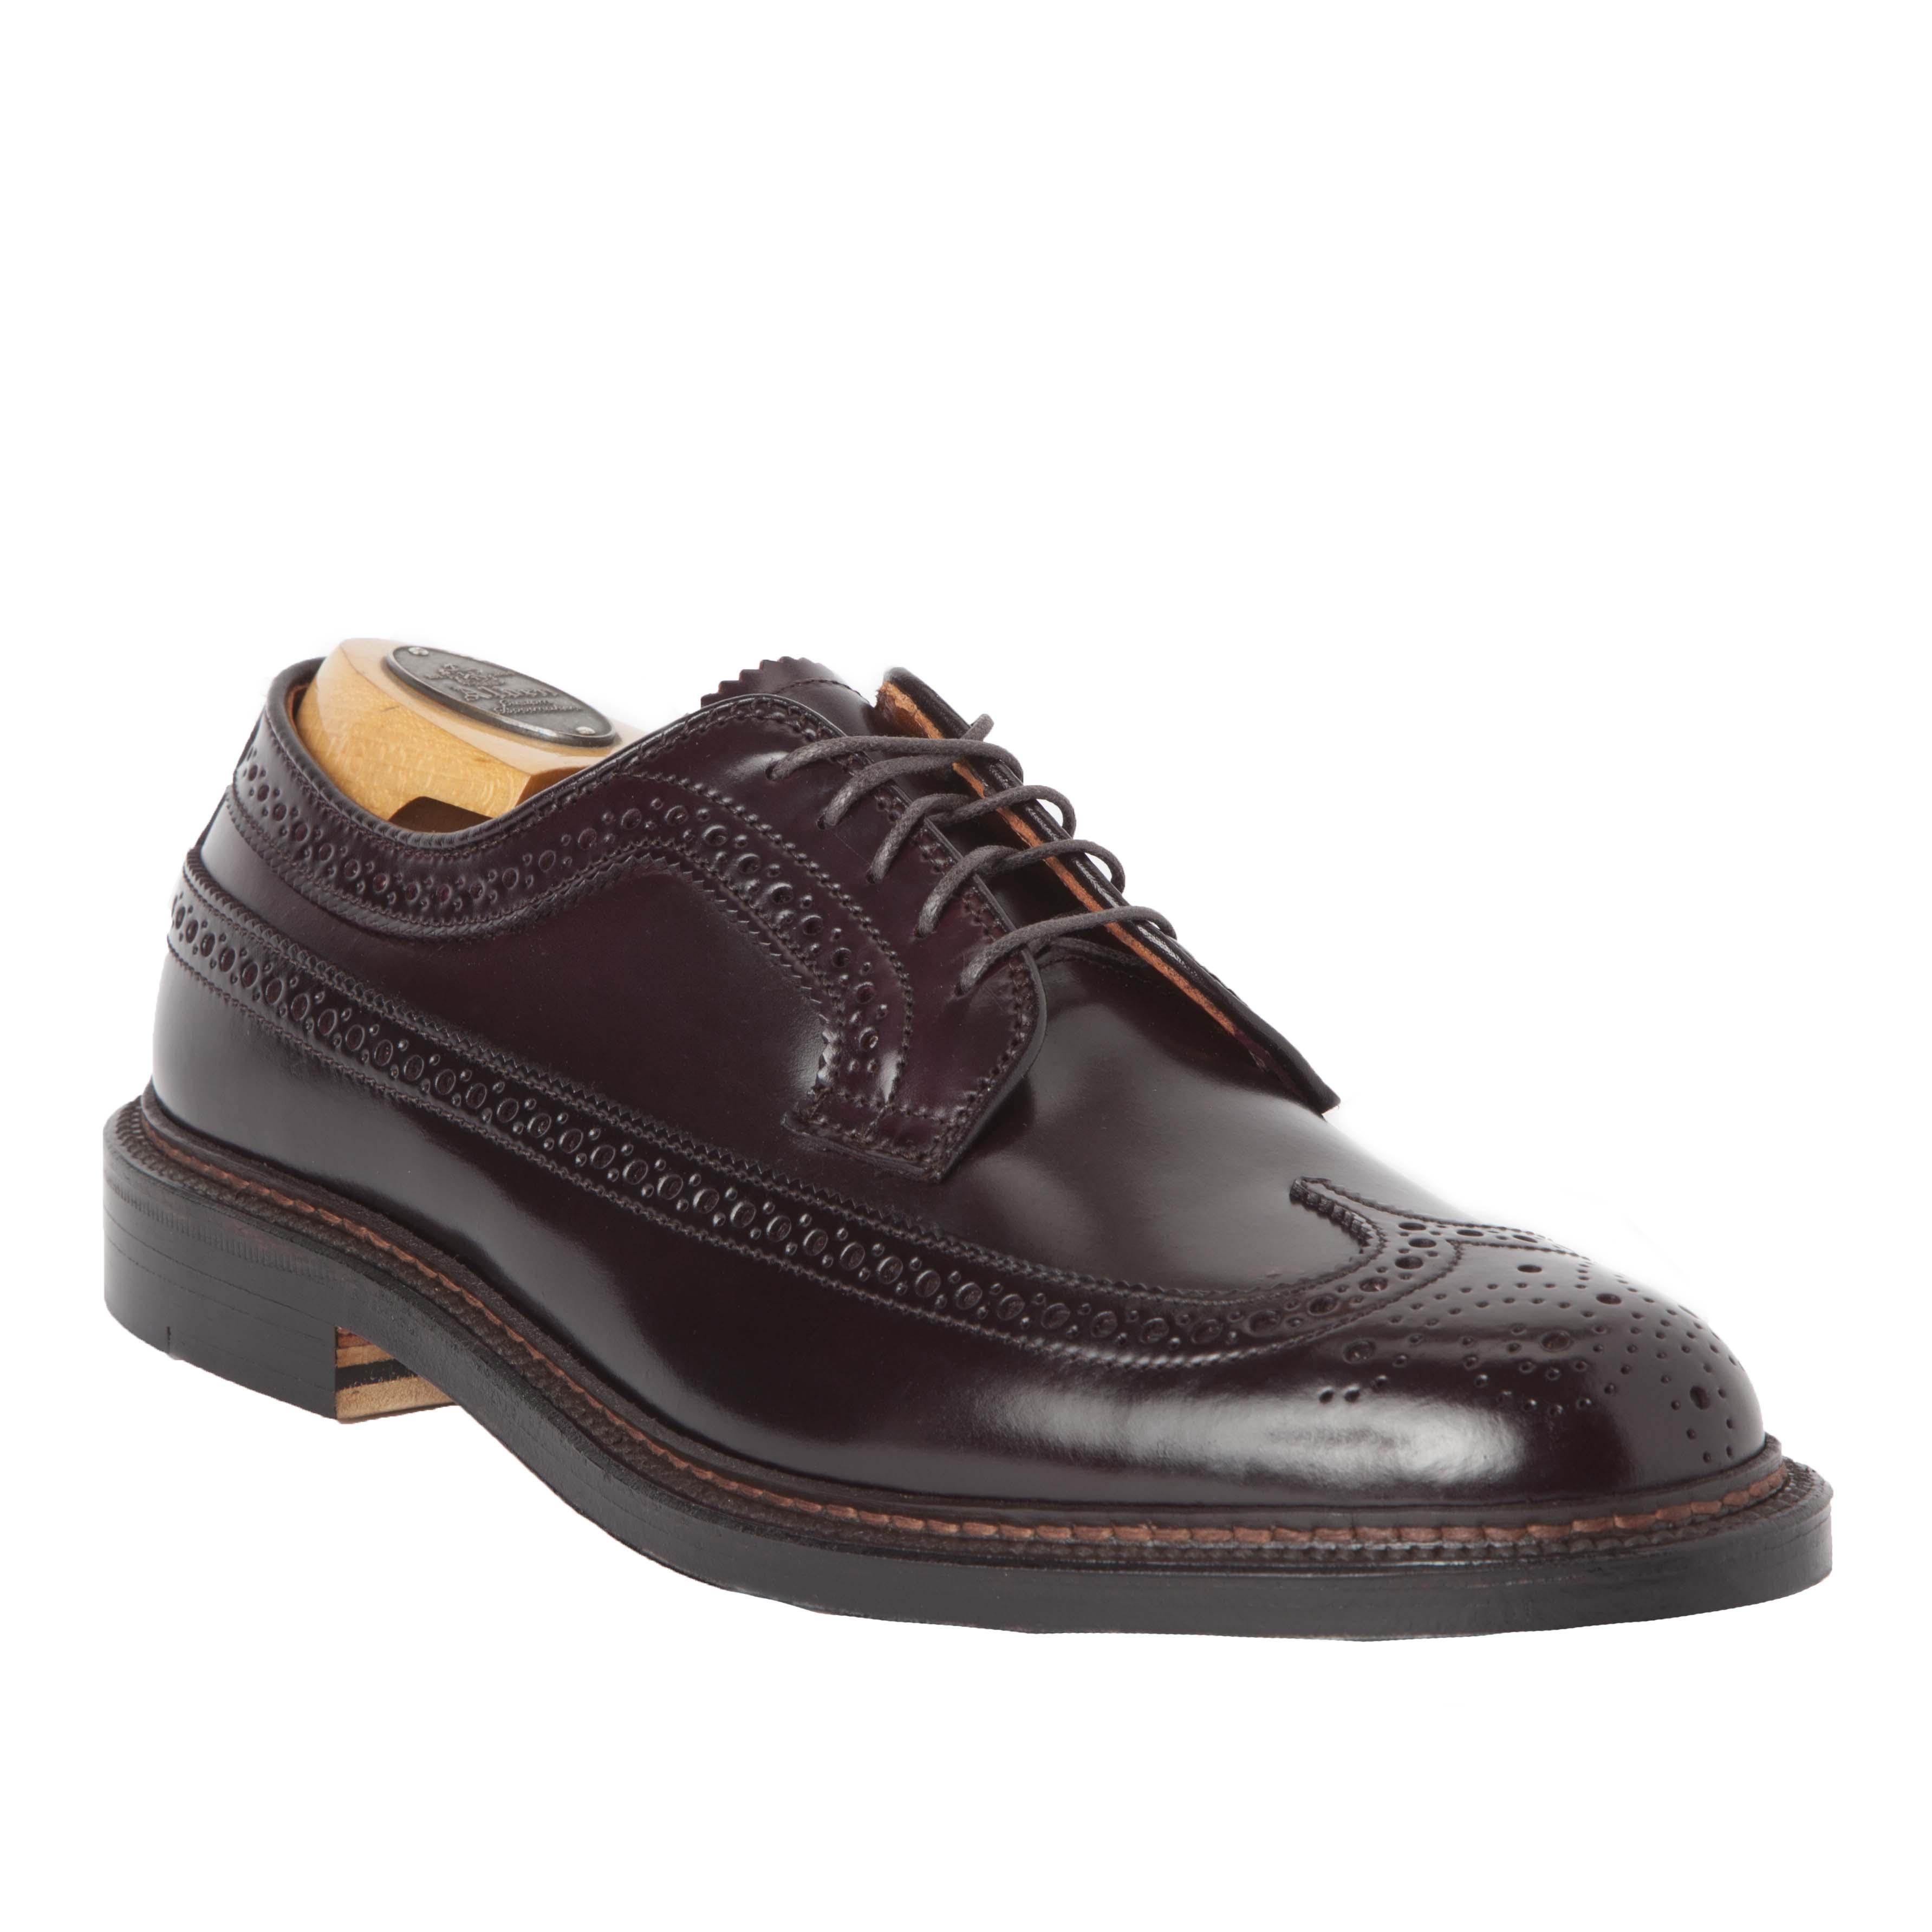 Long Wing Bluchercolor 8 Shell Cordovan975 Alden Shoes